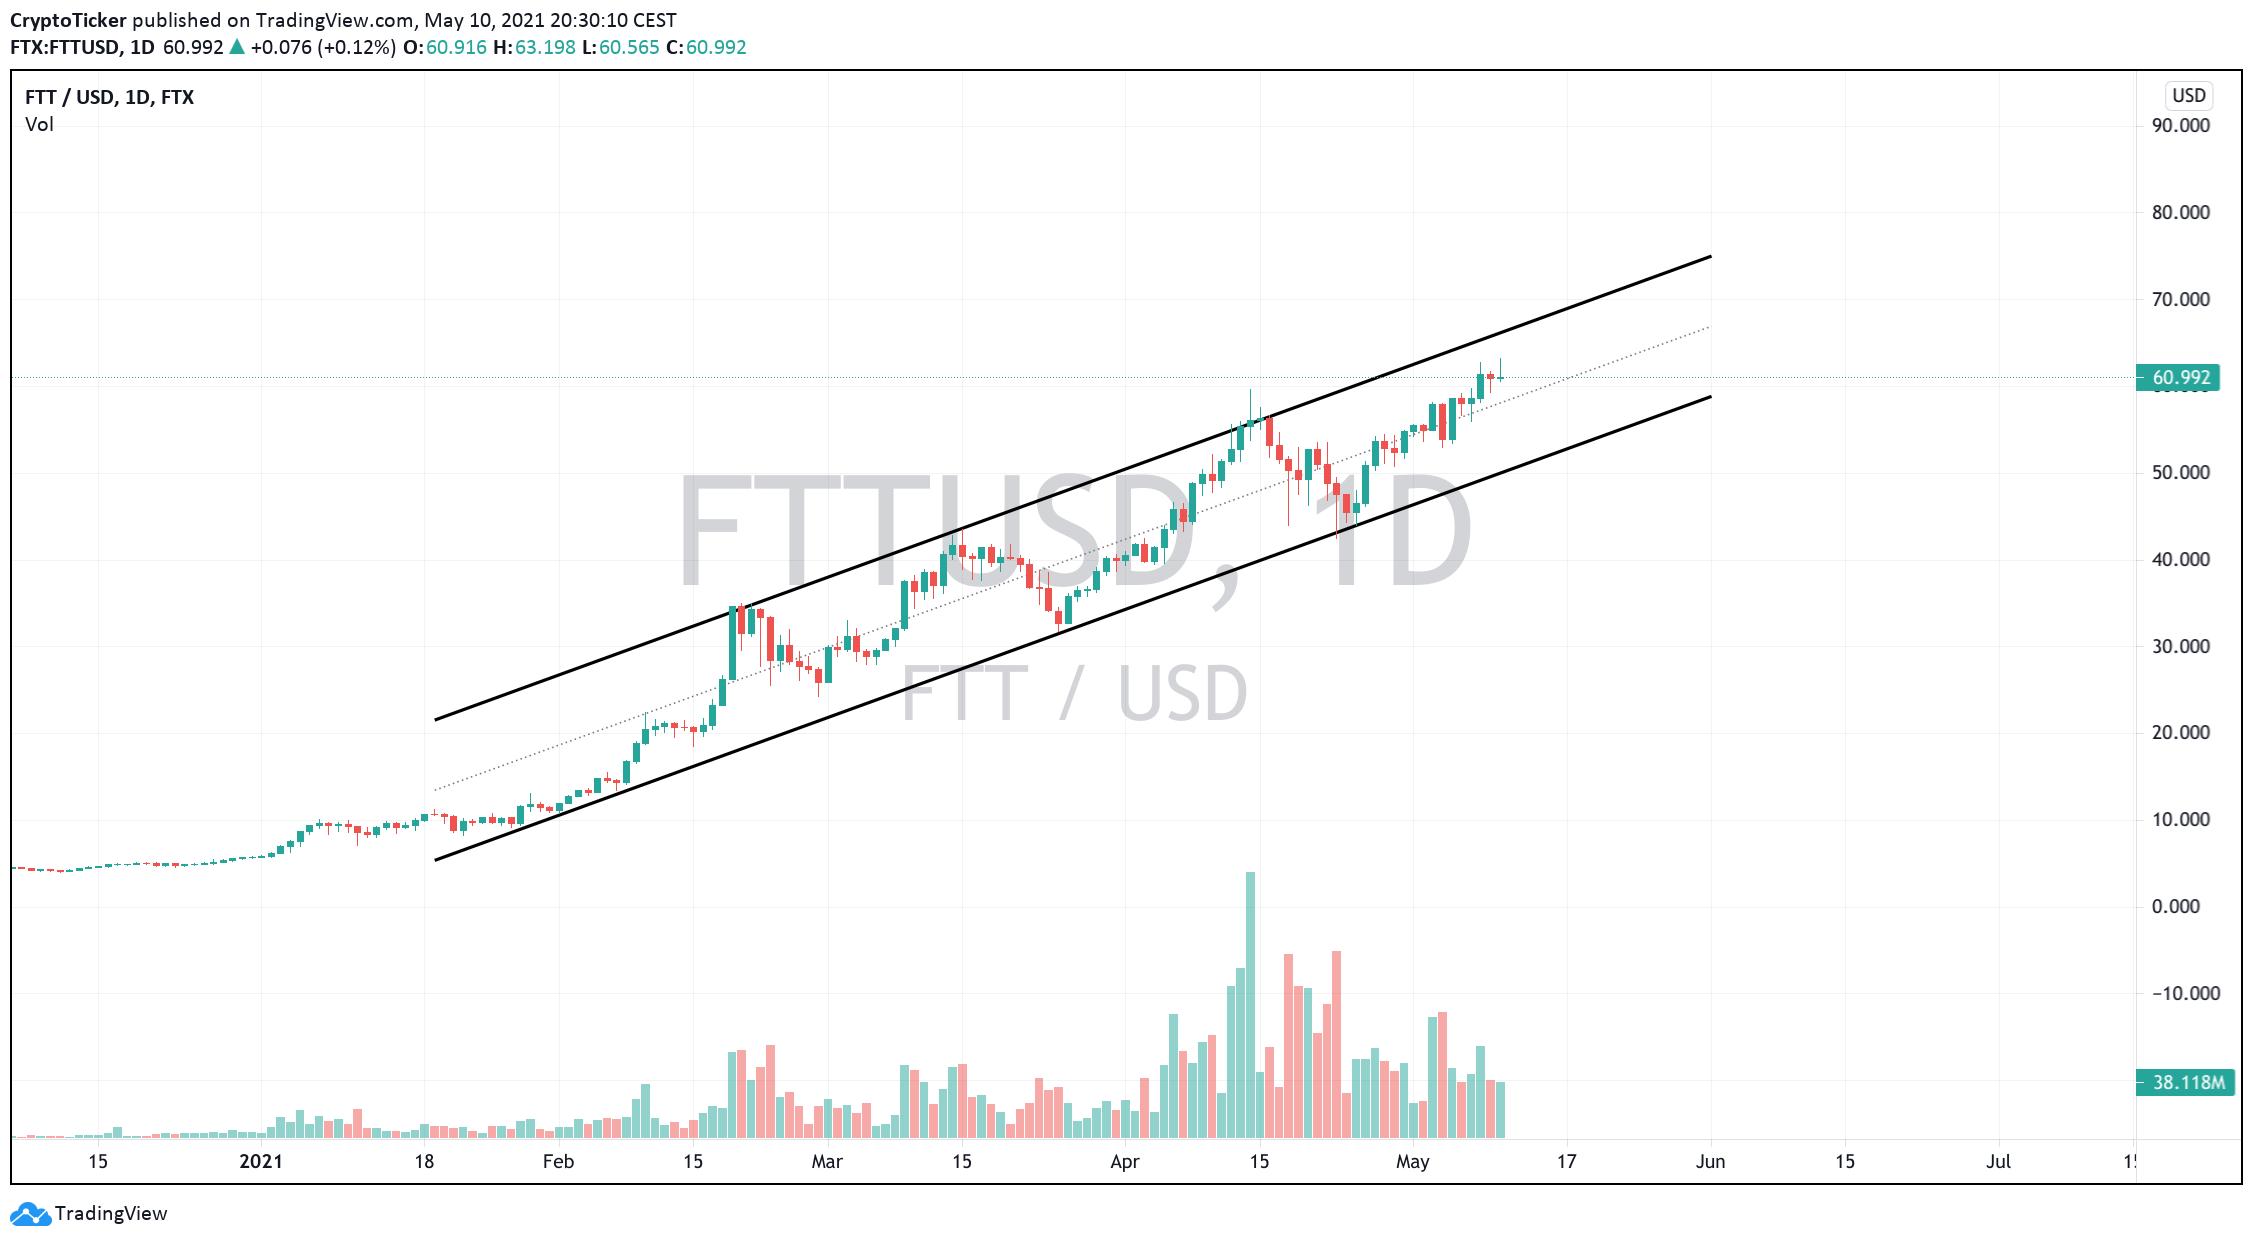 FTT/USD 1-day chart